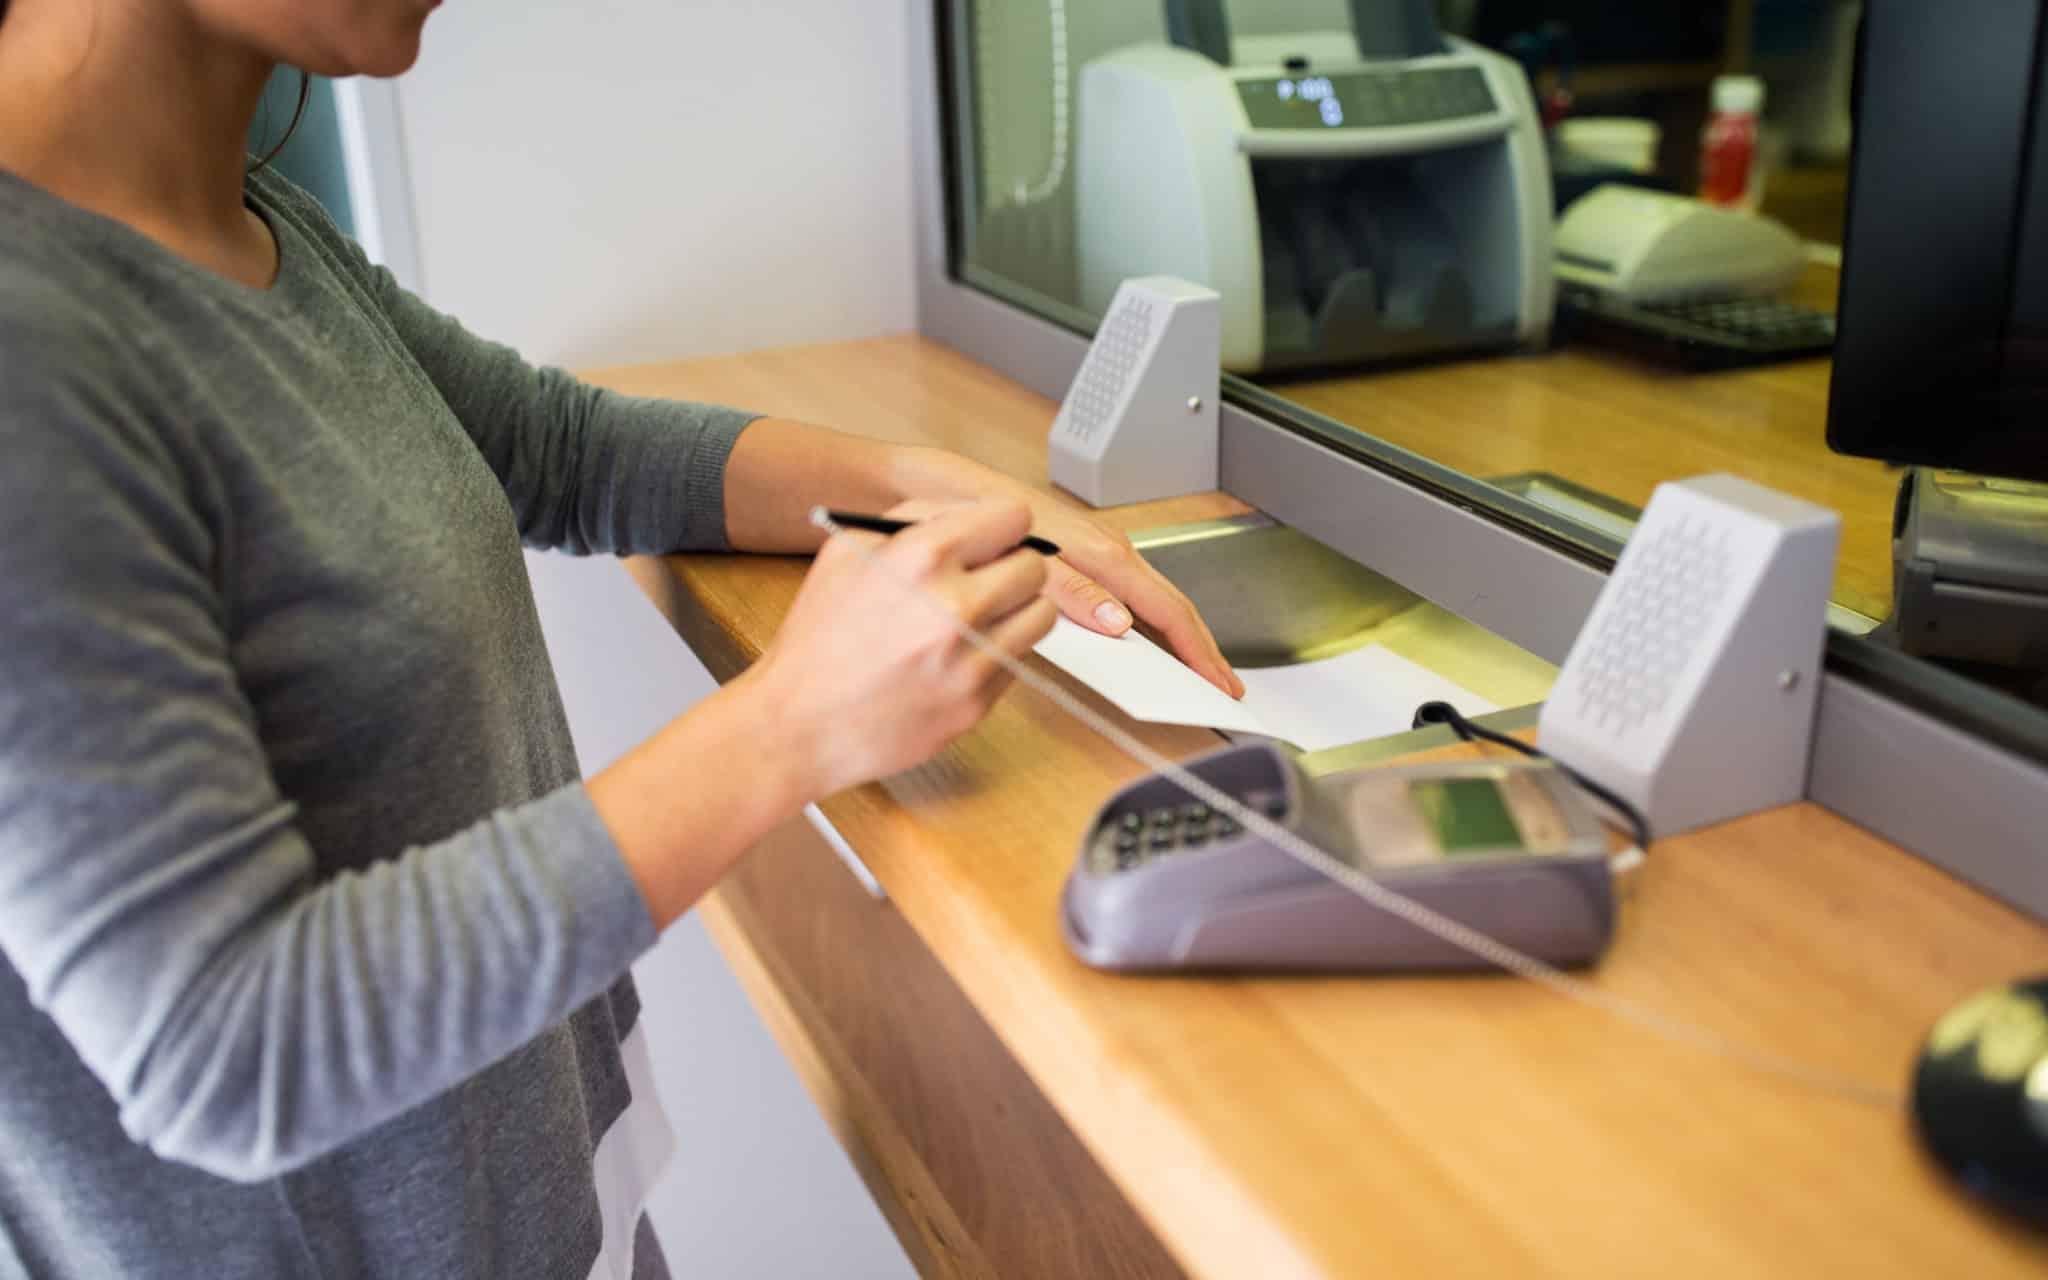 https://blog.globalcaja.es/wp-content/uploads/2019/03/elegir-cuenta-bancaria.jpg